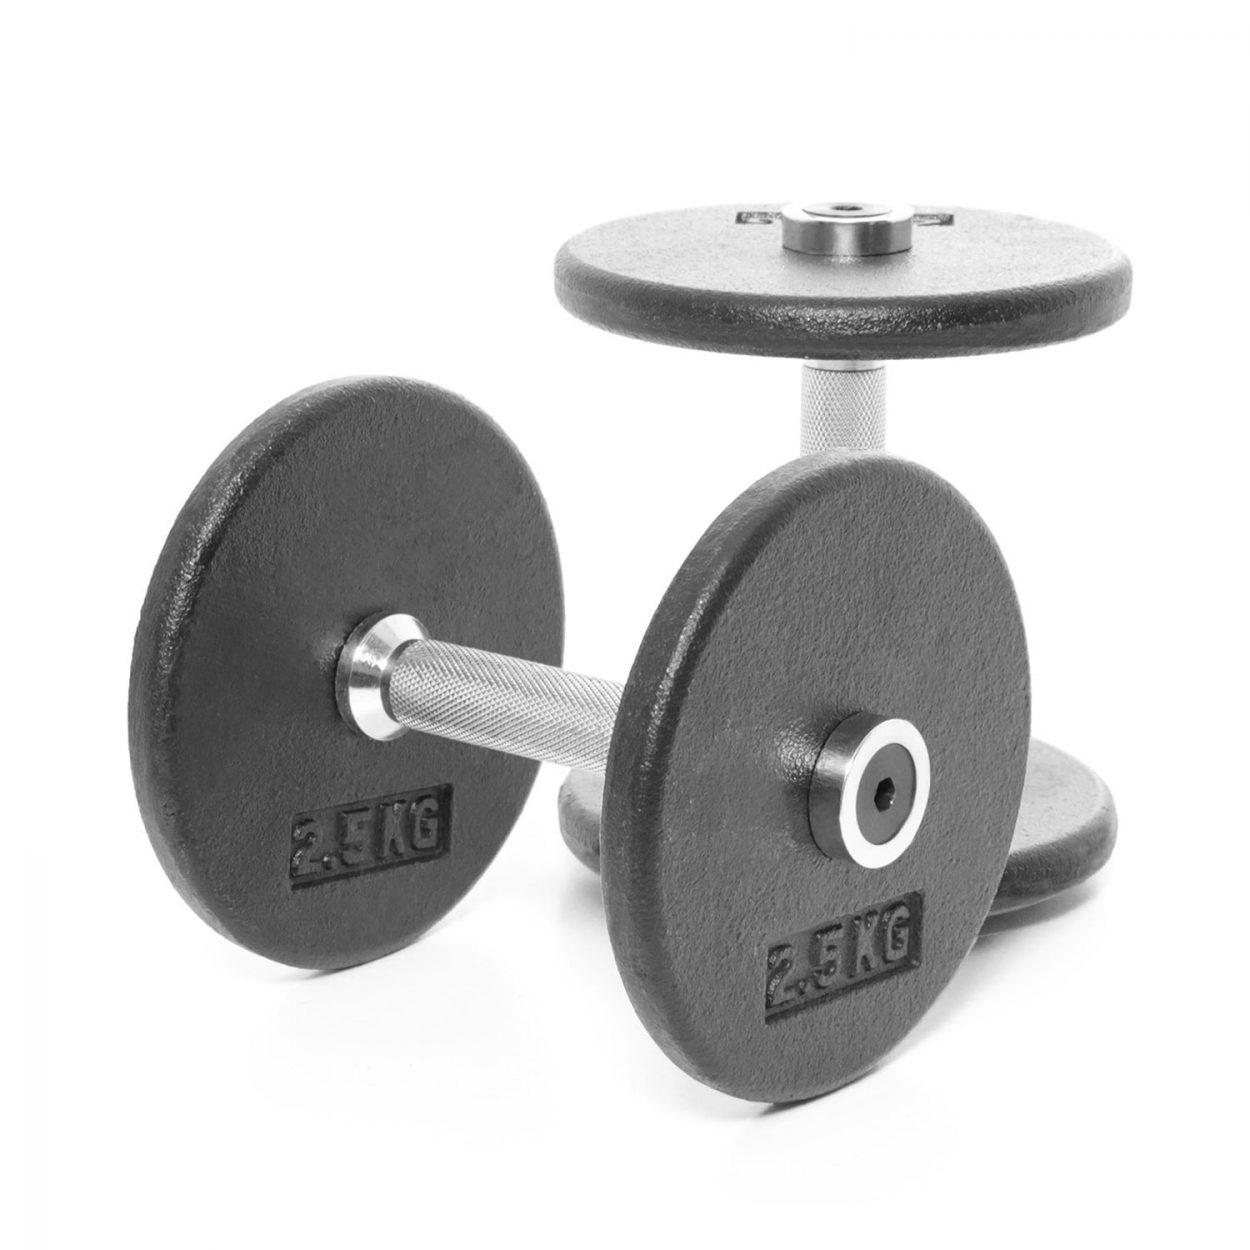 Body Power Pro-style Dumbbells 5kg (x2)